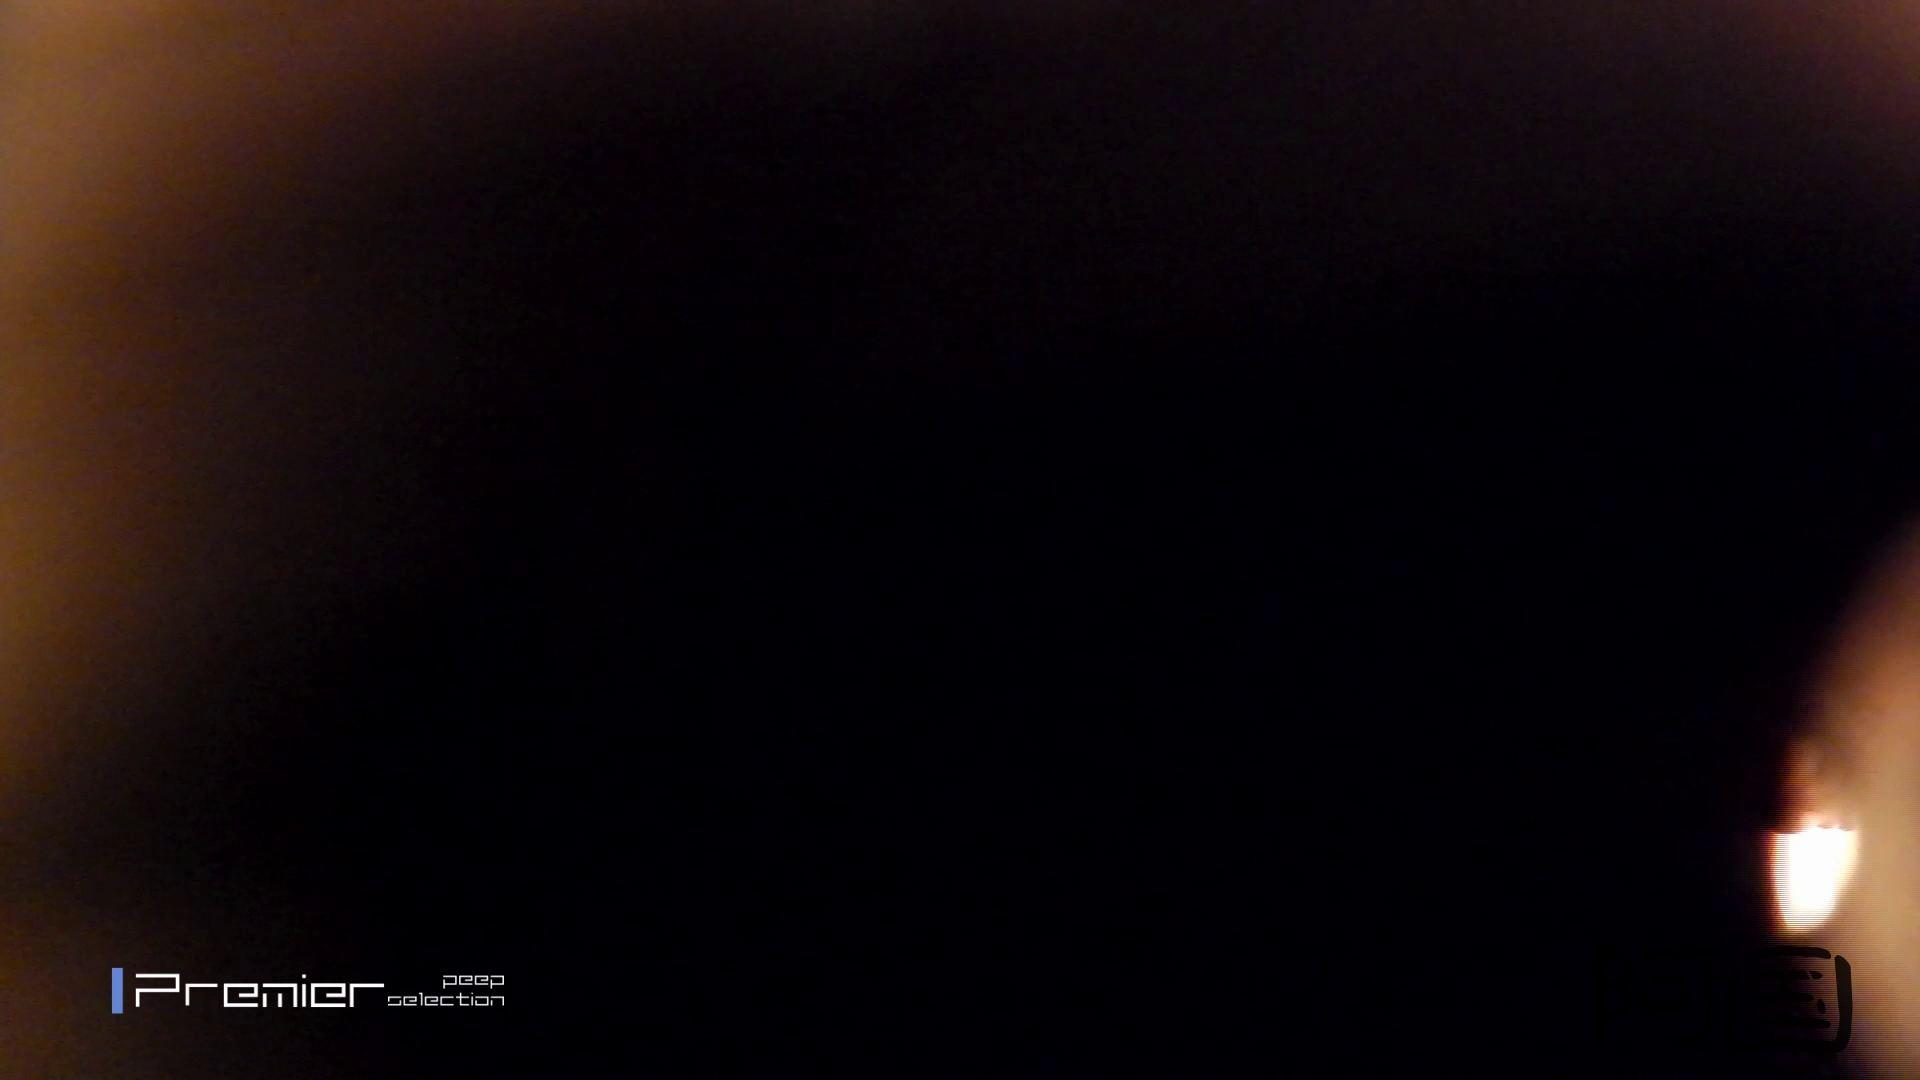 和式洋式七変化 Vol.34 最終作、 シリーズ最高の美人登場 洗面所  91pic 76